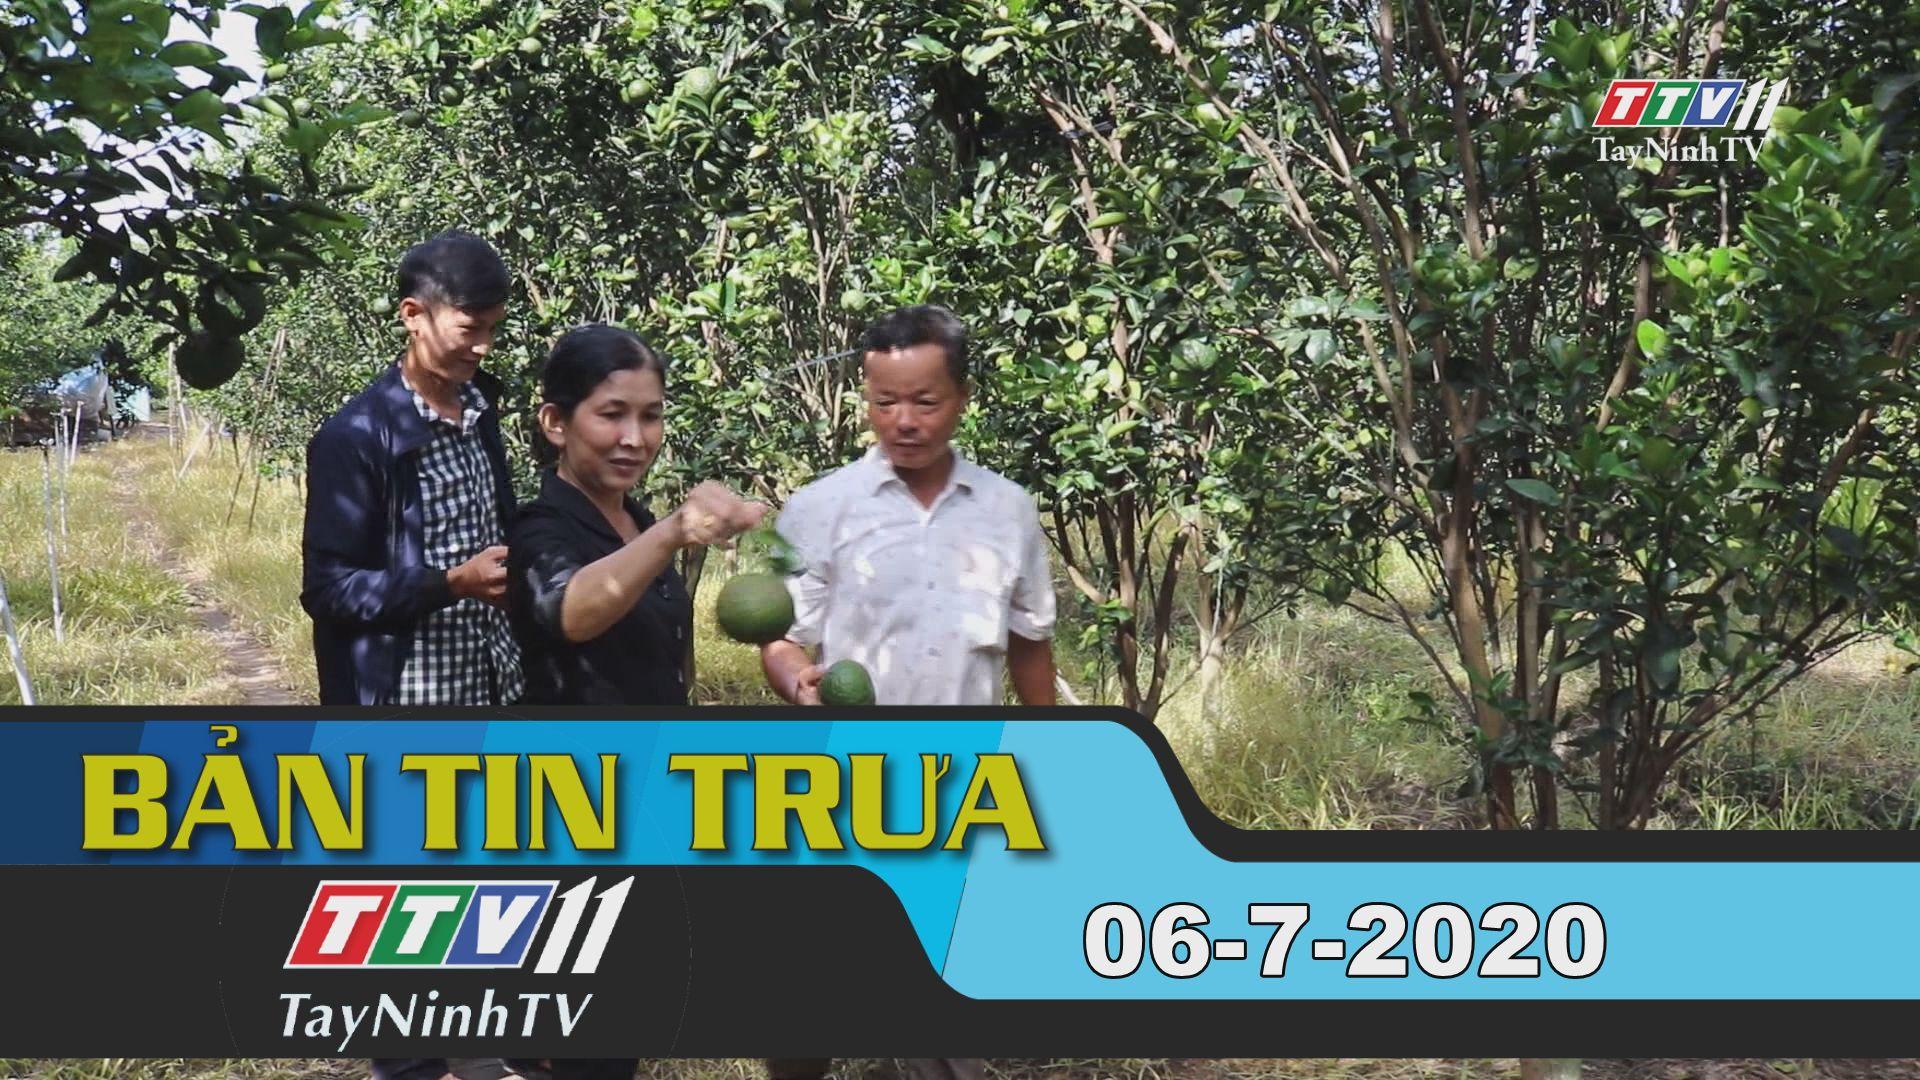 Bản tin trưa 06-7-2020 | Tin tức hôm nay | TayNinhTV